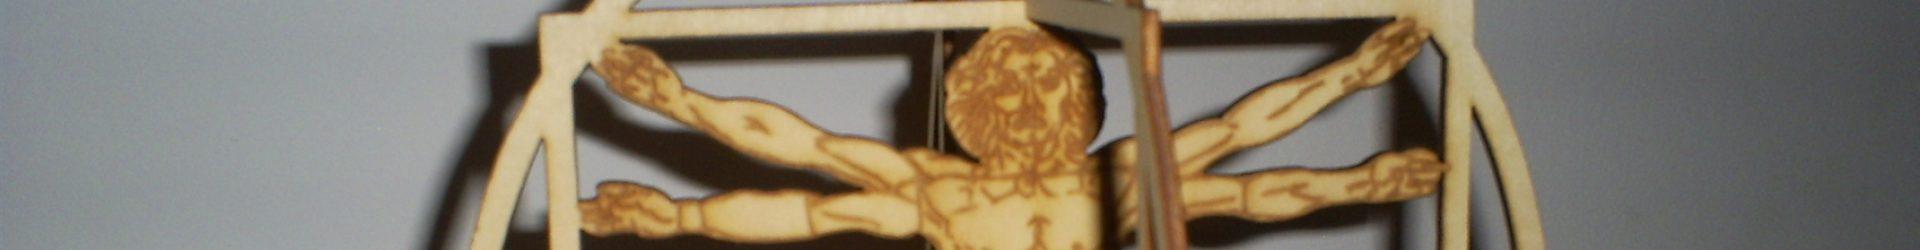 Leonardowerkstatt